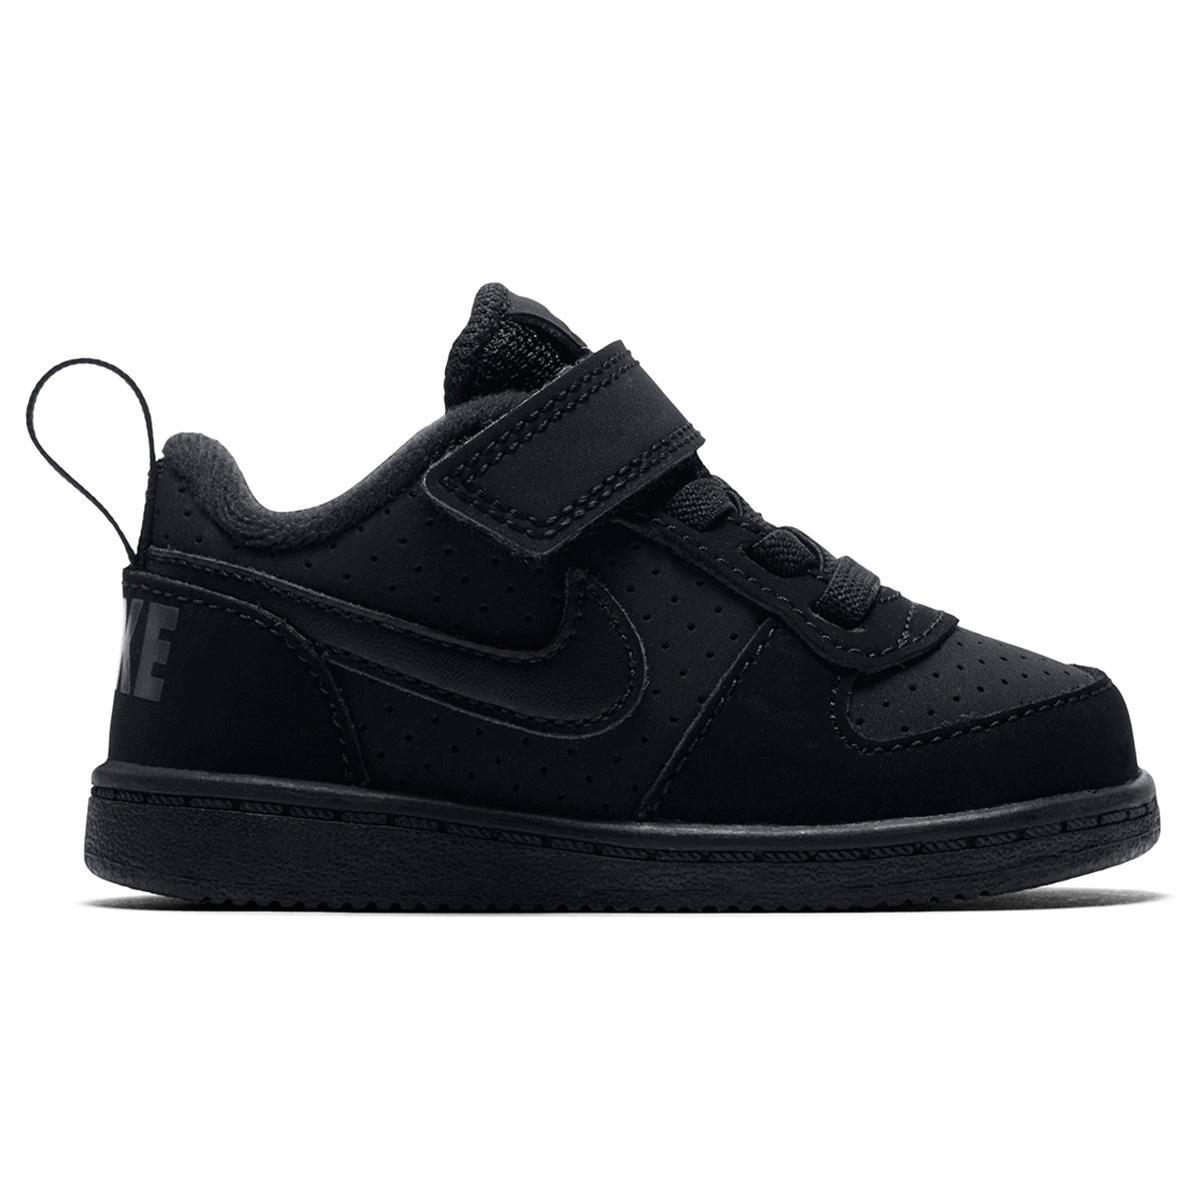 adcf4926f0e Tênis Infantil Nike Court Borough Low Masculino - Preto - Compre ...